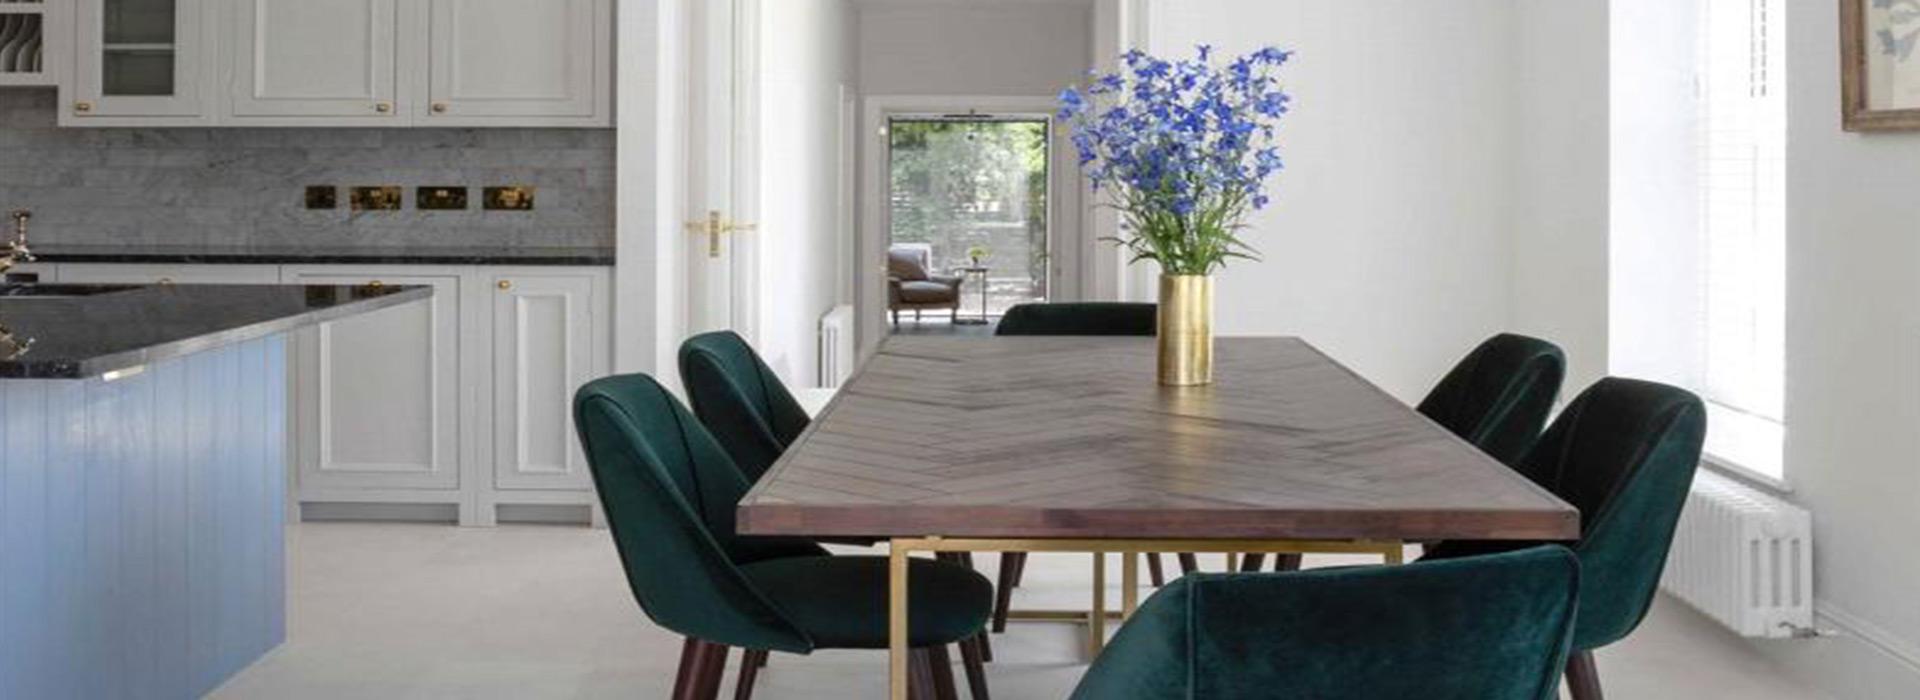 Herringbone dining table